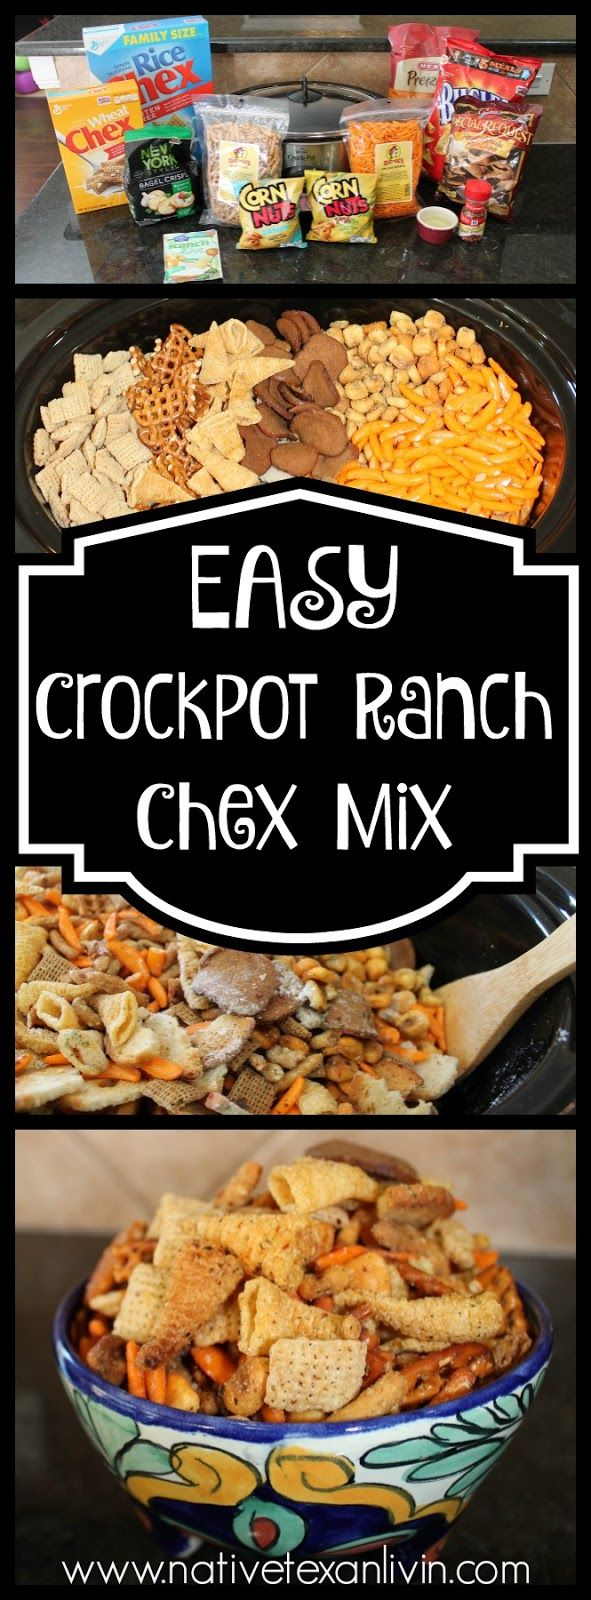 Easy CrockPot Ranch Chex Mix www.nativetexanlivin.com